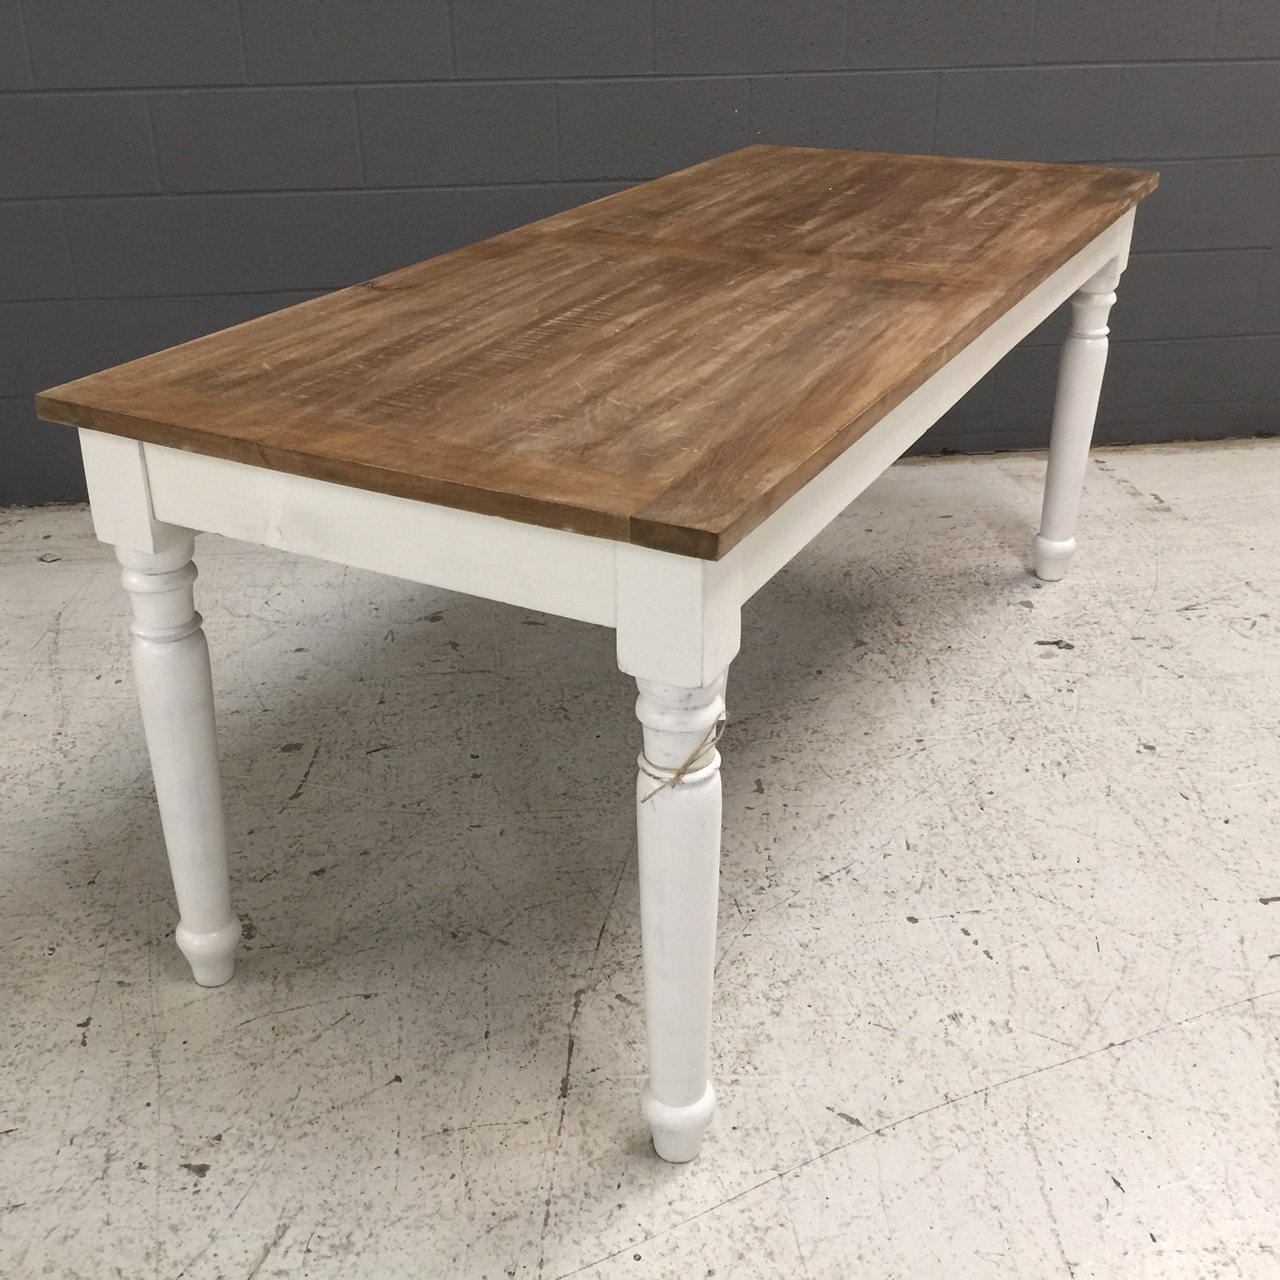 Attractive Nadeau Furniture Nashville #11 - Dining Table